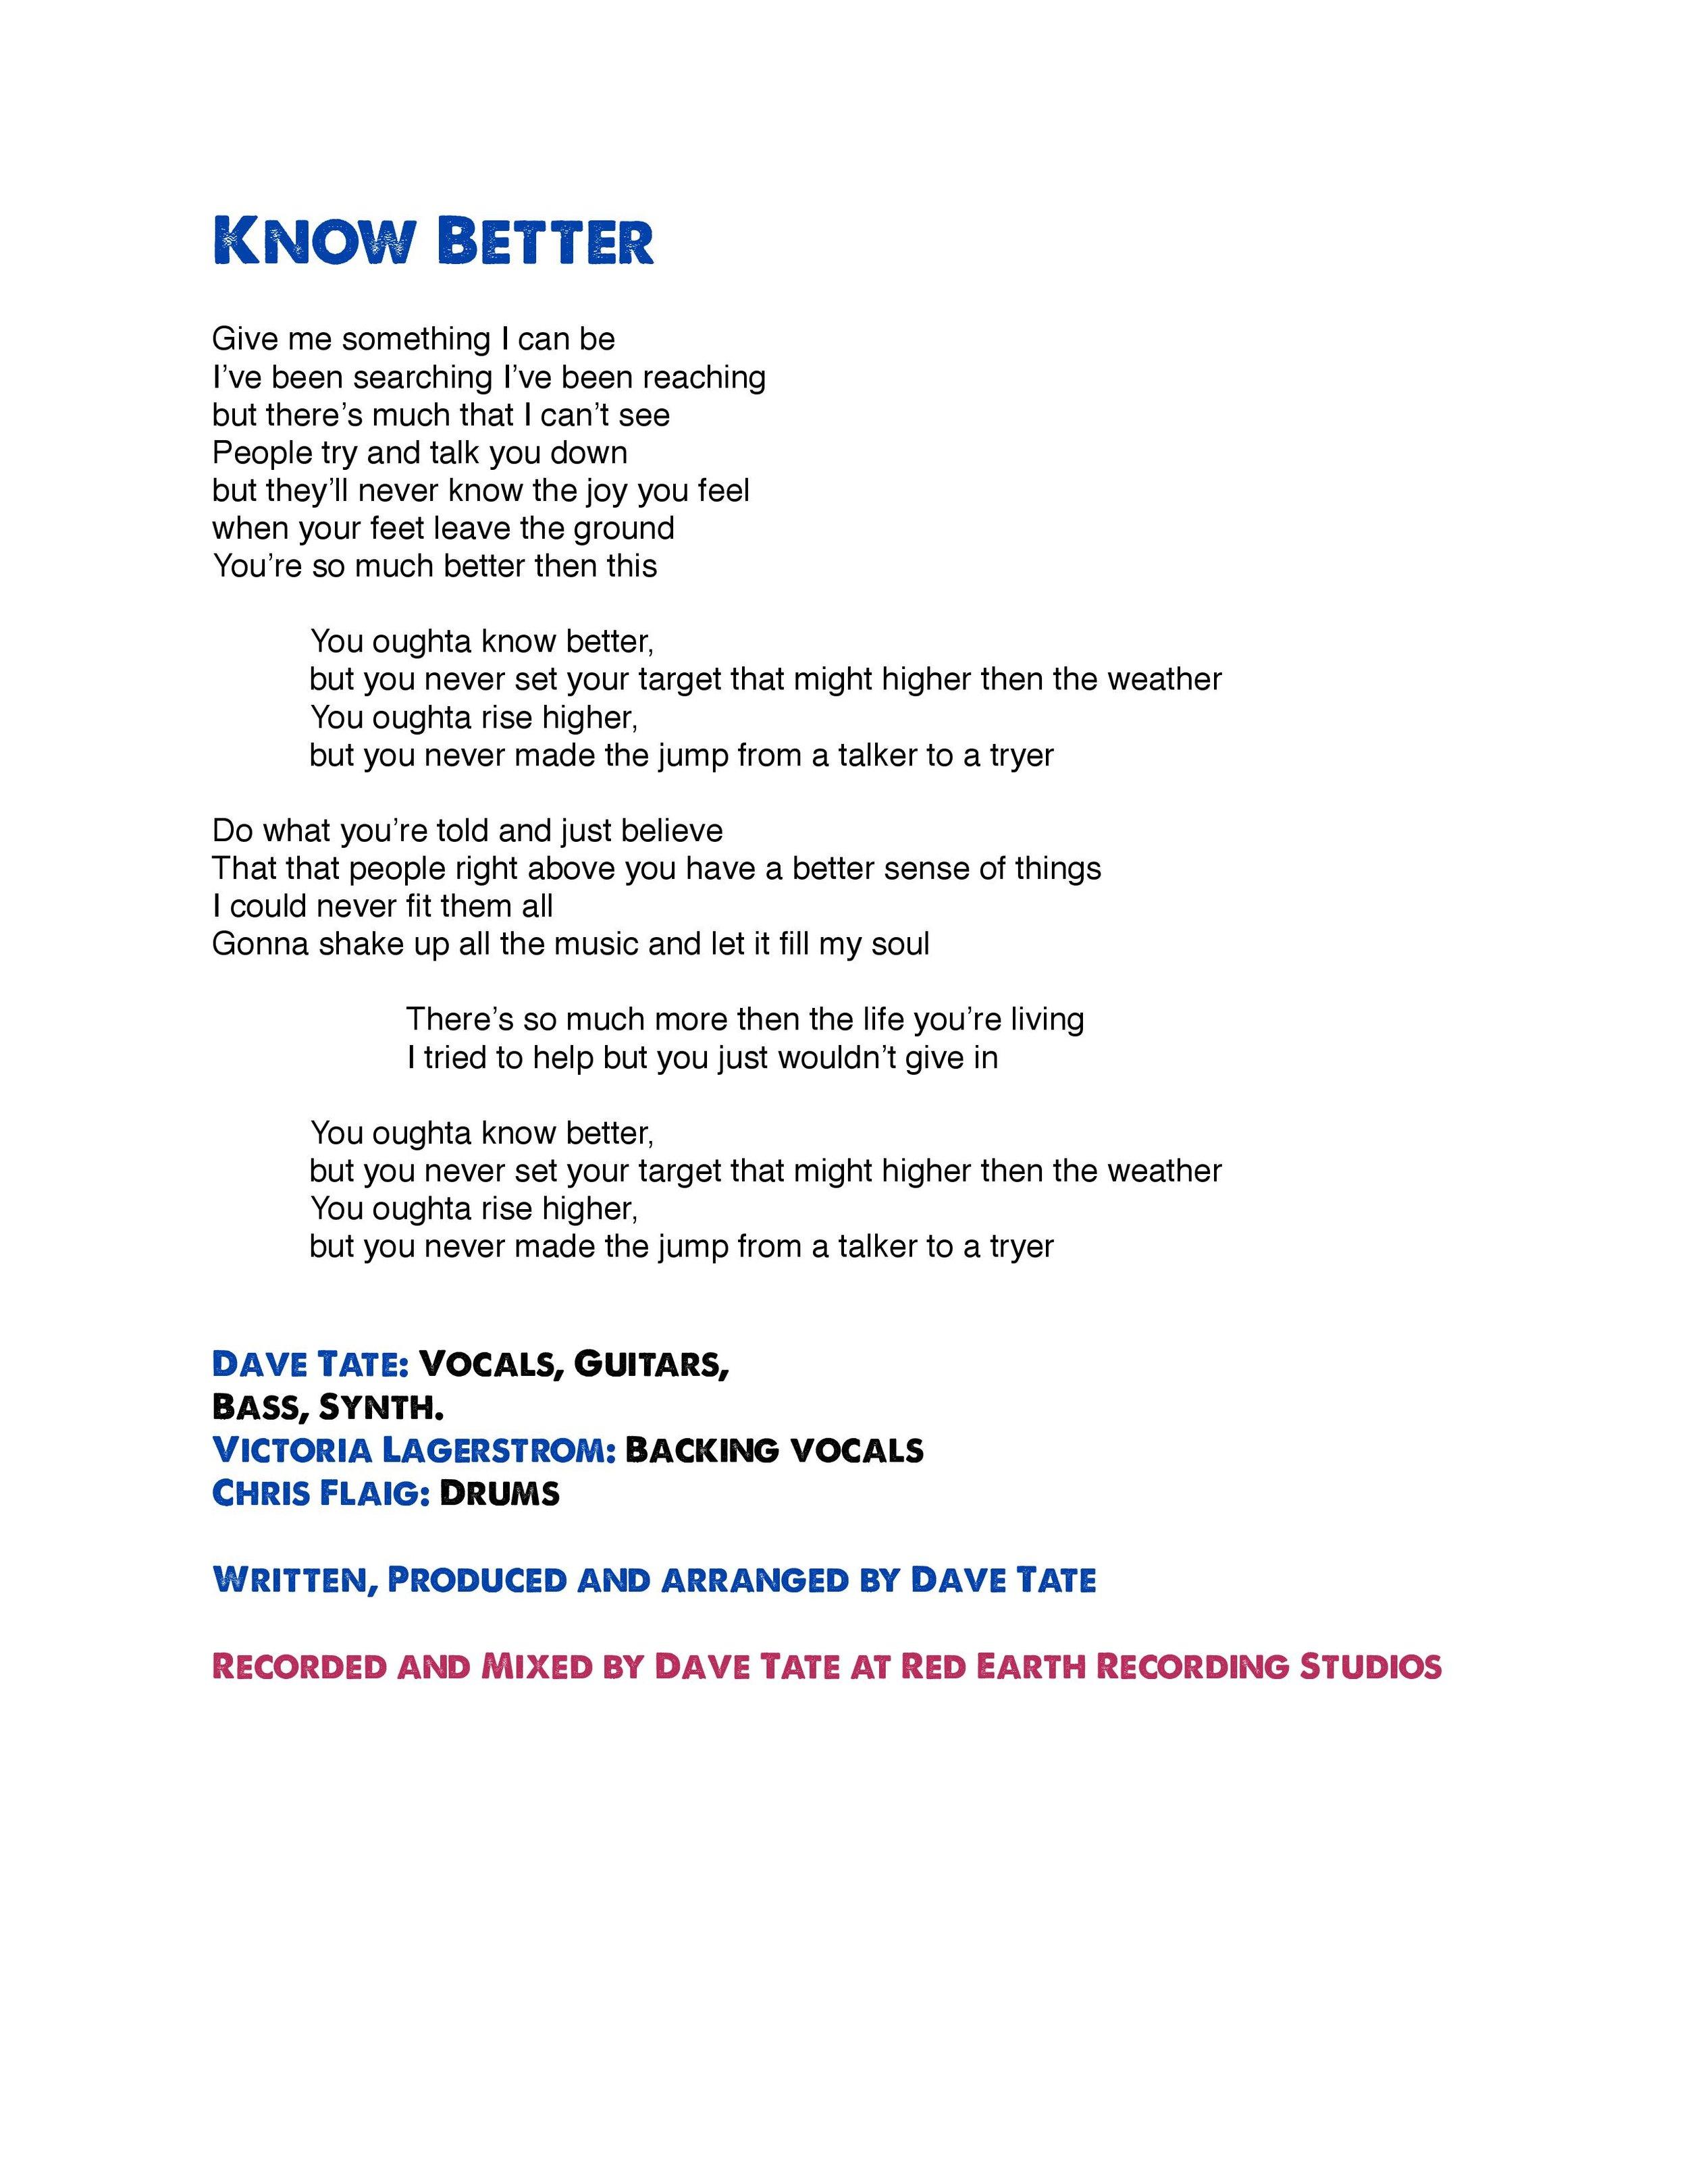 3 Know Better Lyrics-page-001.jpg